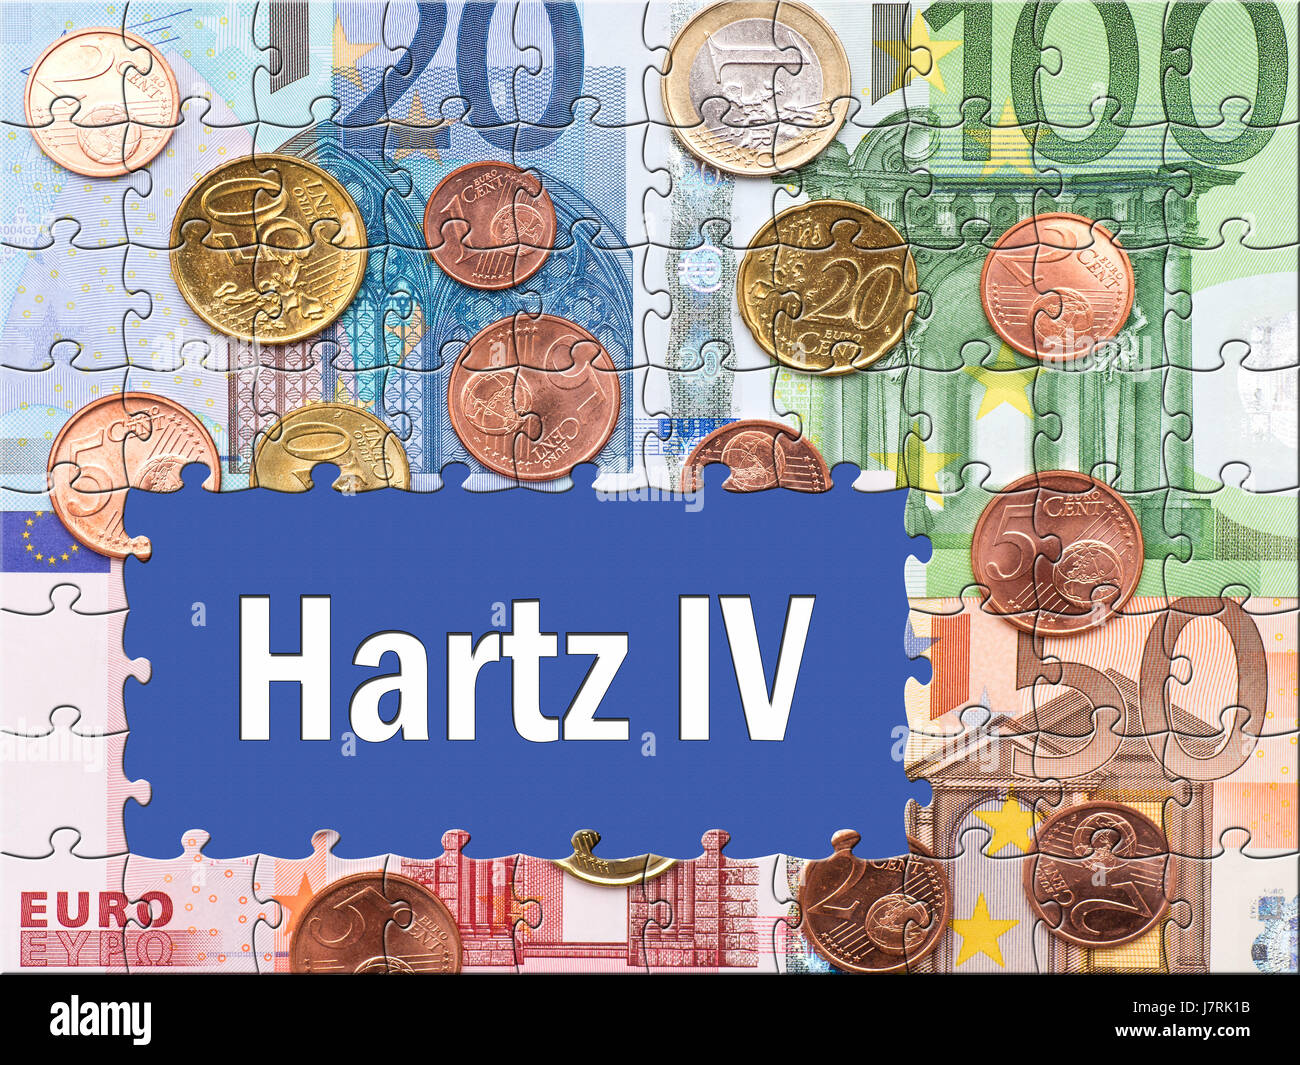 euro unemployment labour exchange hartz assistance help support aid unemployed - Stock Image